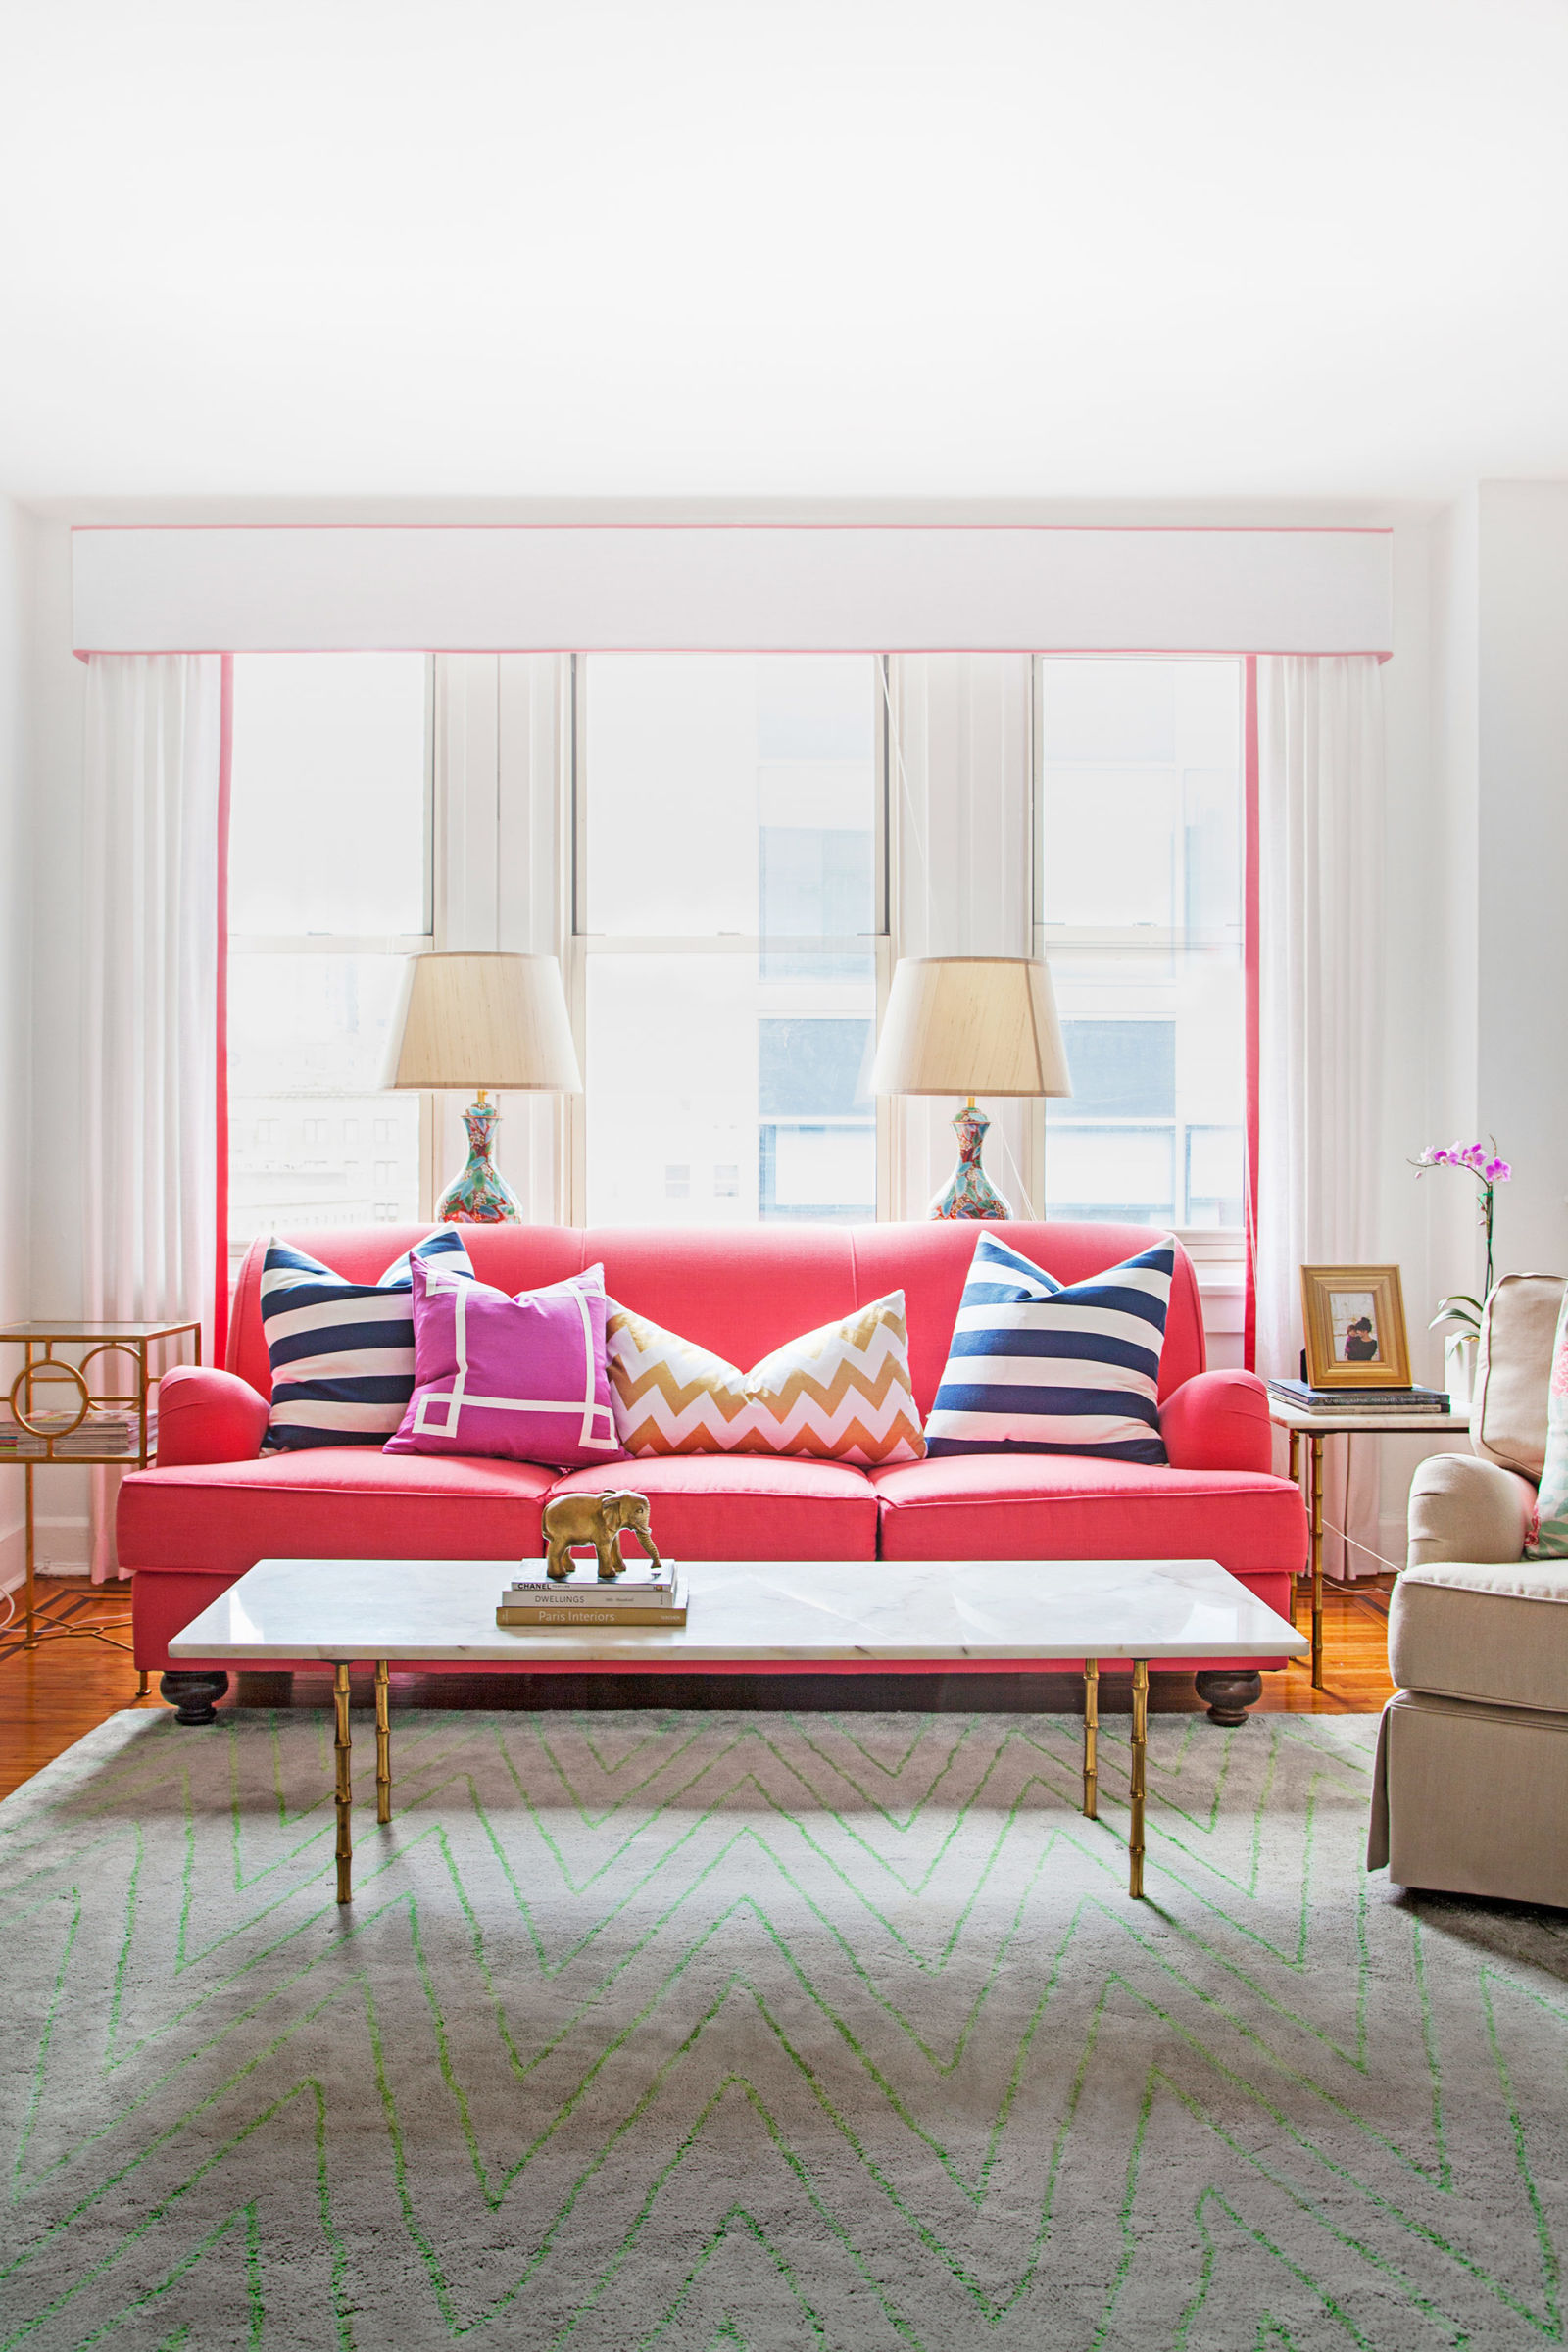 Living Room Sets Philadelphia caitlin wilson philadelphia apartment - colorful home decor